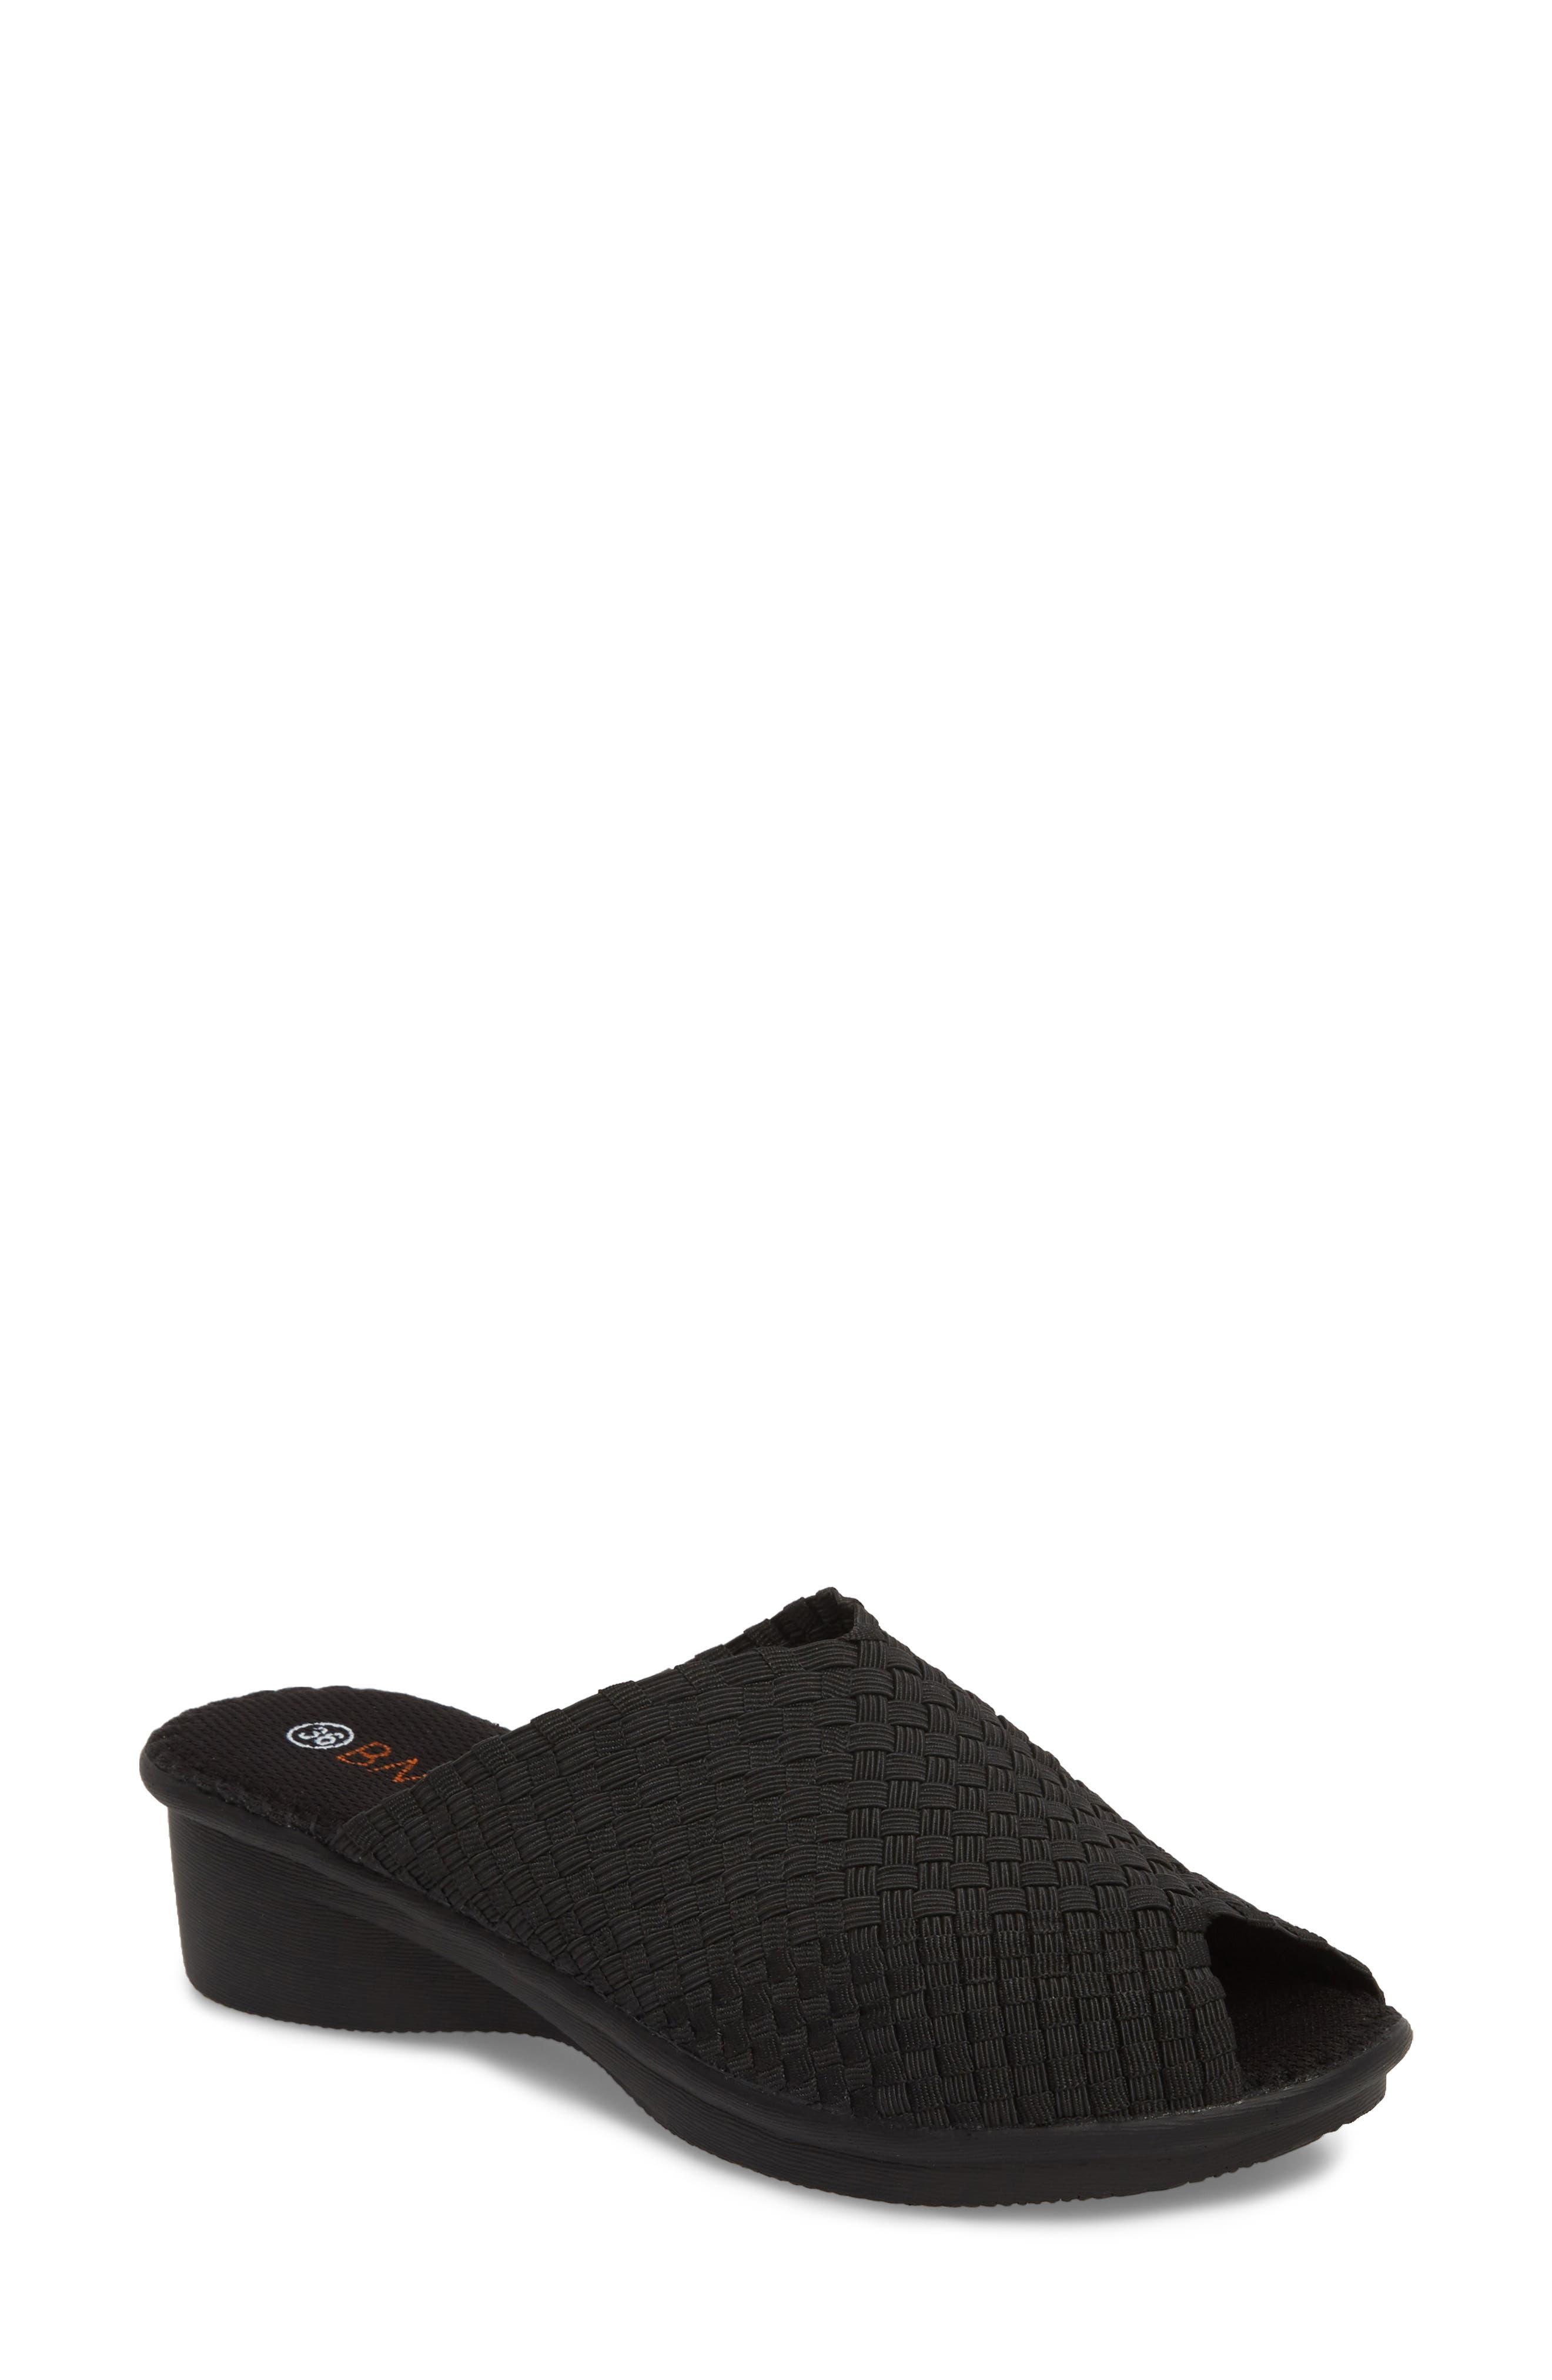 Cyrene Wedge Sandal,                         Main,                         color, BLACK FABRIC